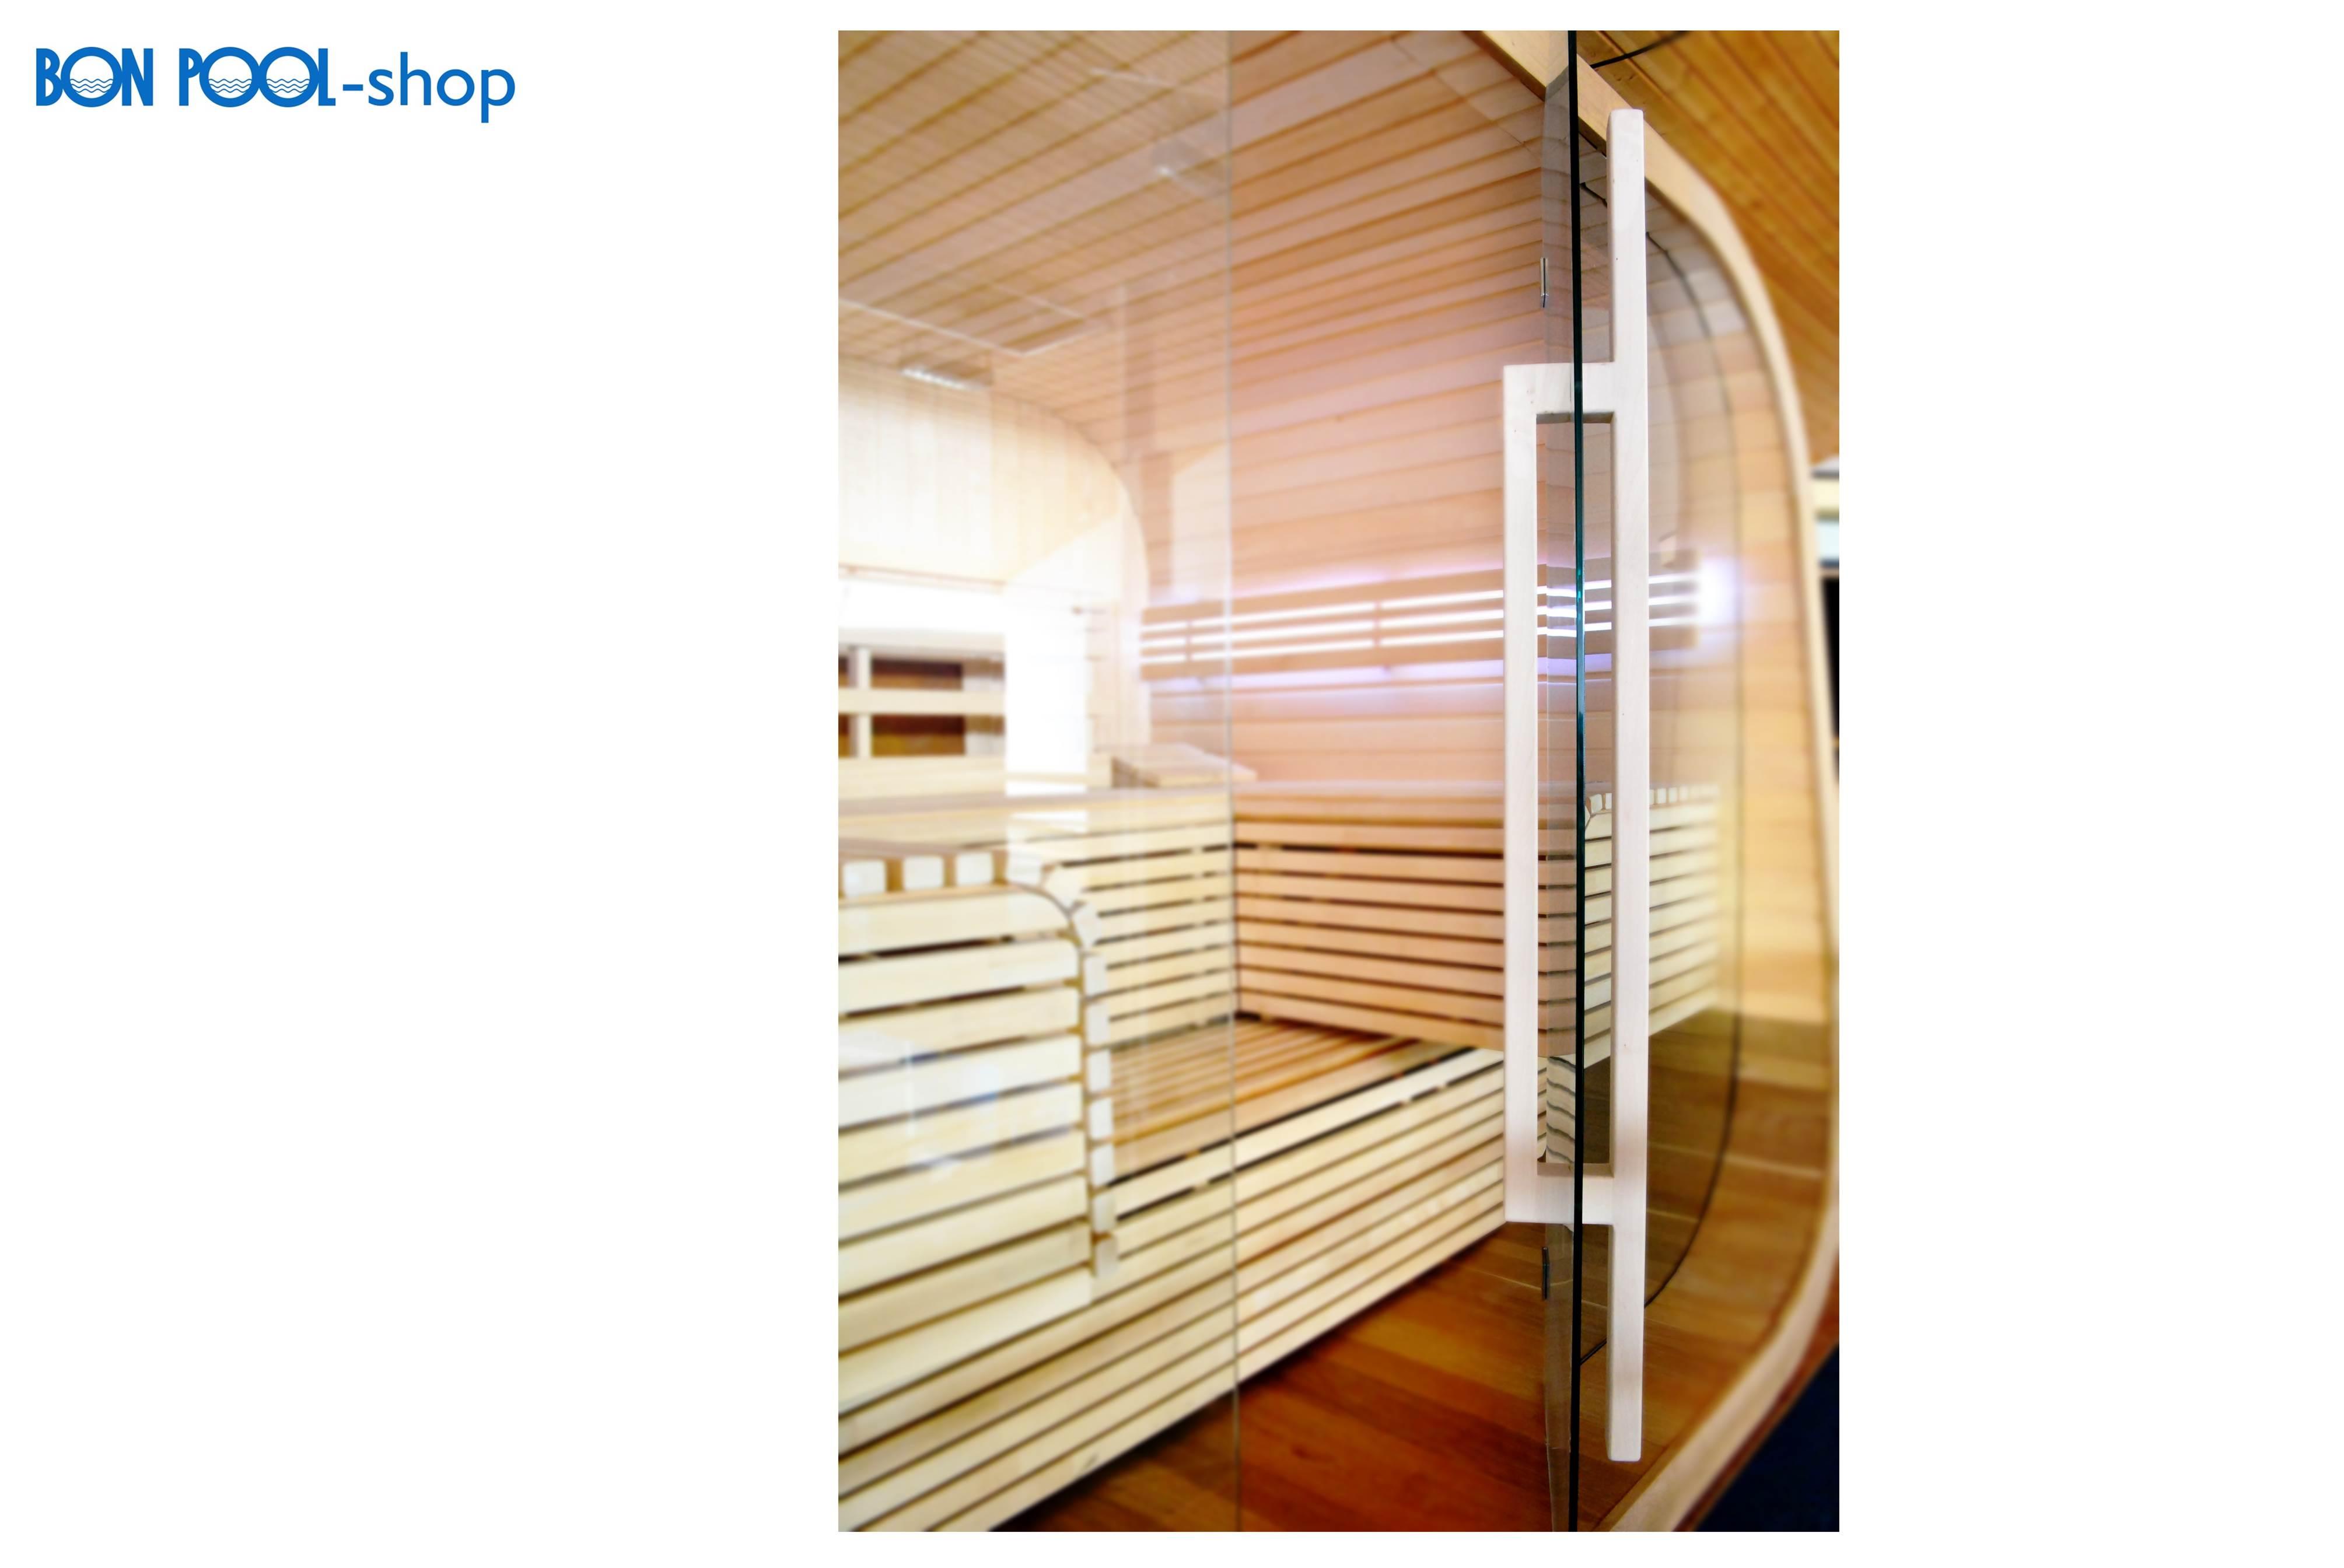 Saunatür Glas set komplett ersatz ahorn bon pool